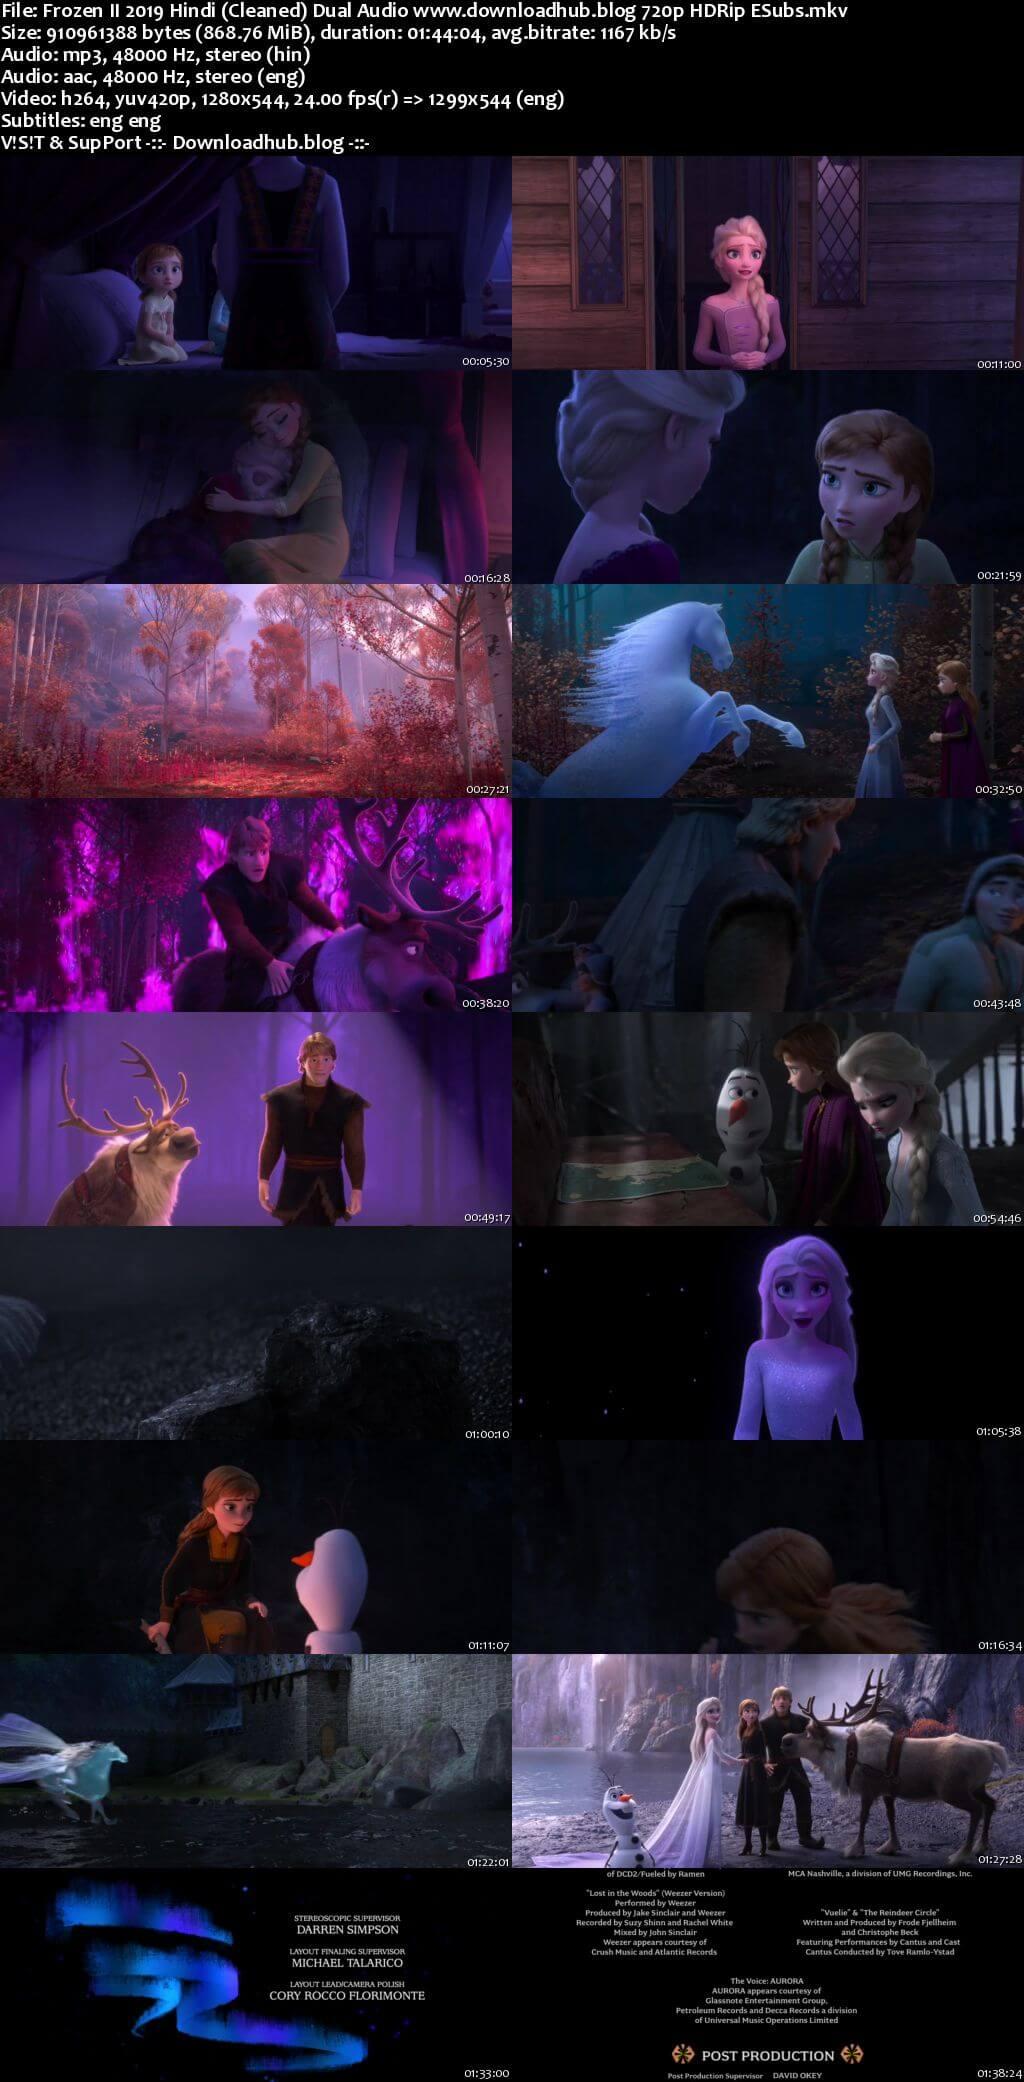 Frozen II 2019 Hindi (Cleaned) Dual Audio 720p HDRip ESubs